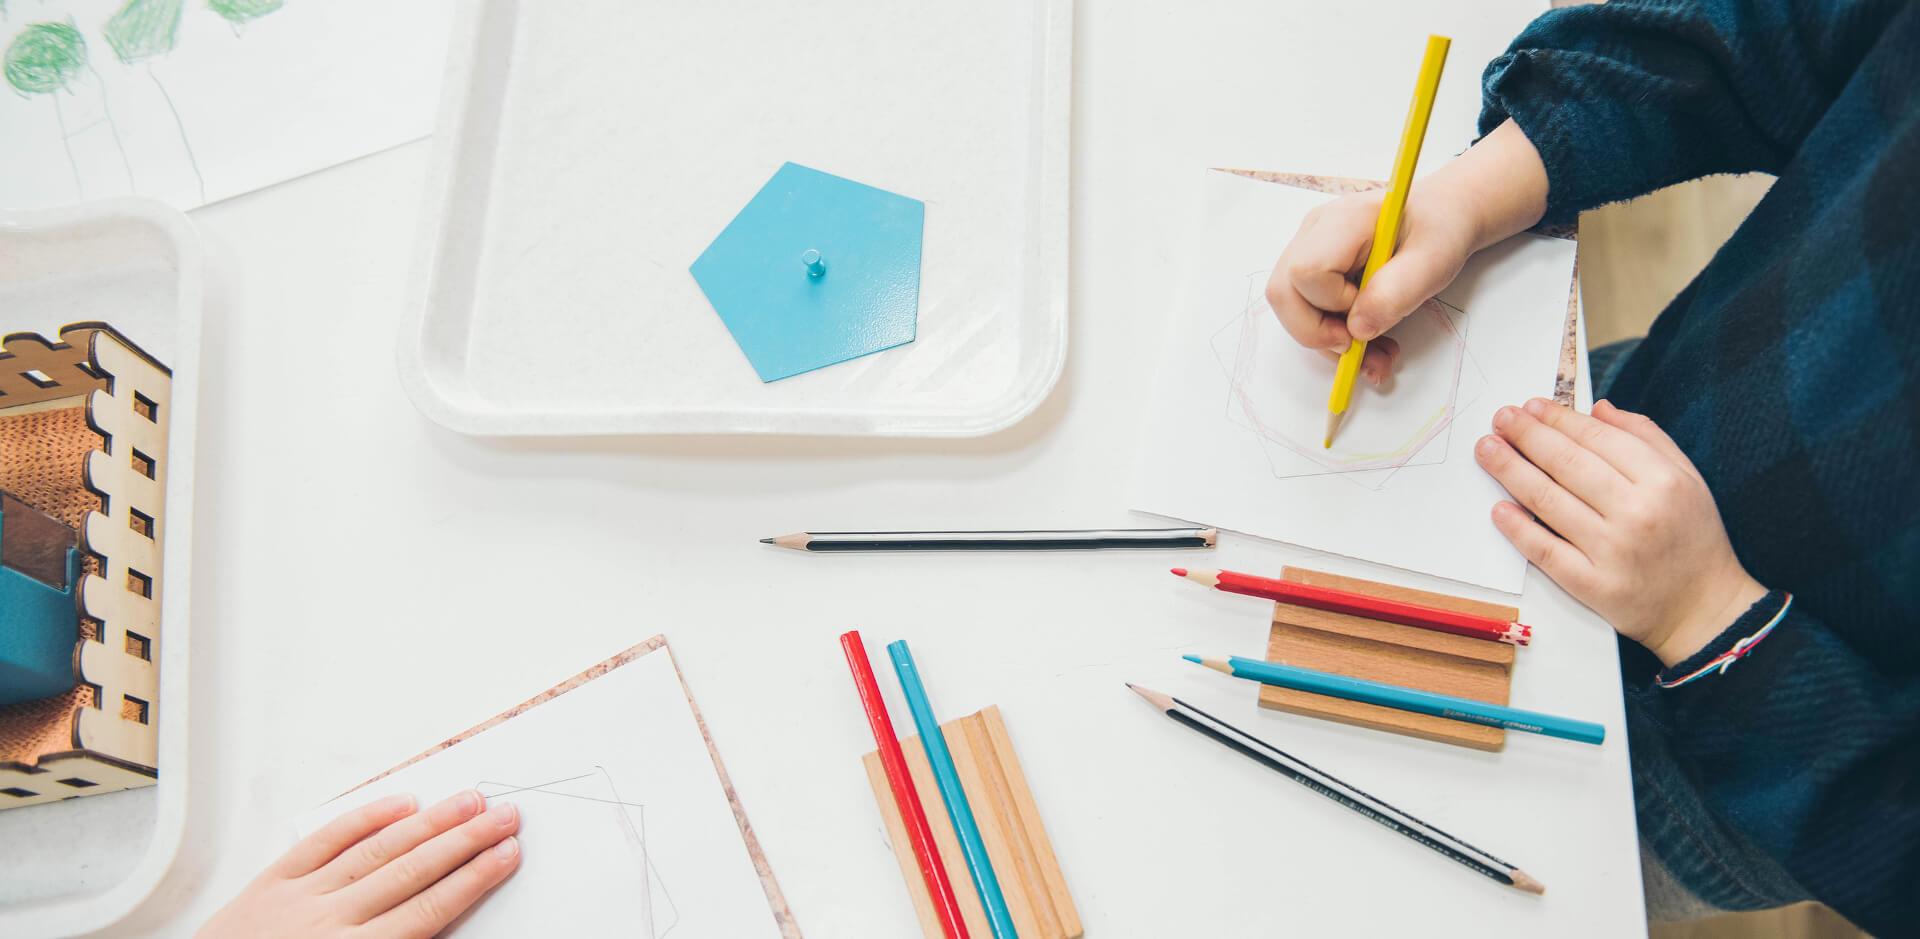 Creación de material didáctico para Internet